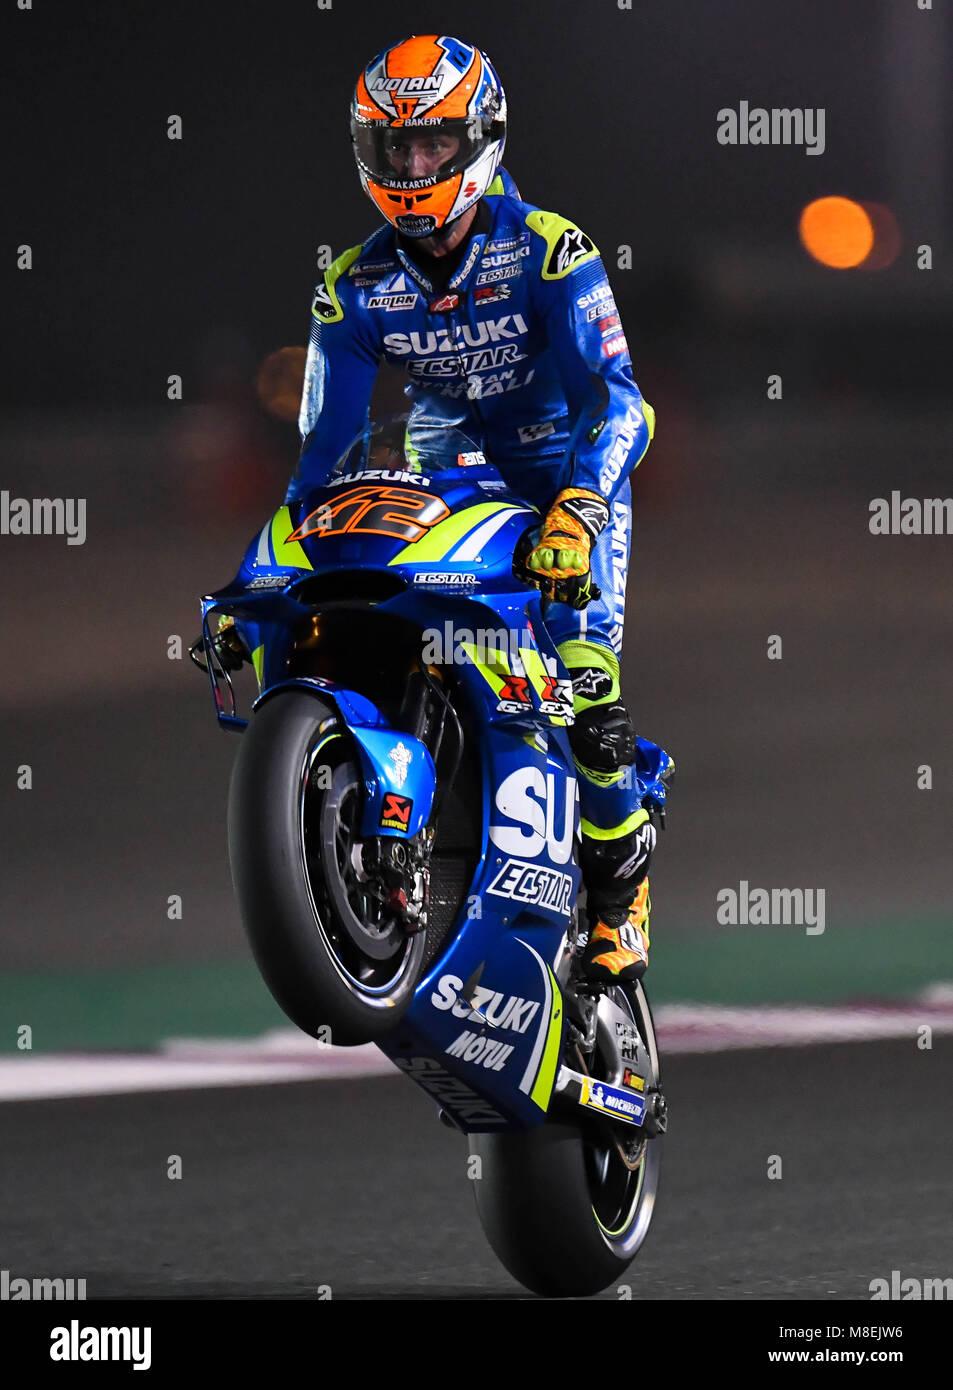 Doha Qatar 16th Mar 2018 Spanish Motogp Rider Alex Rins Of Team Stock Photo Alamy